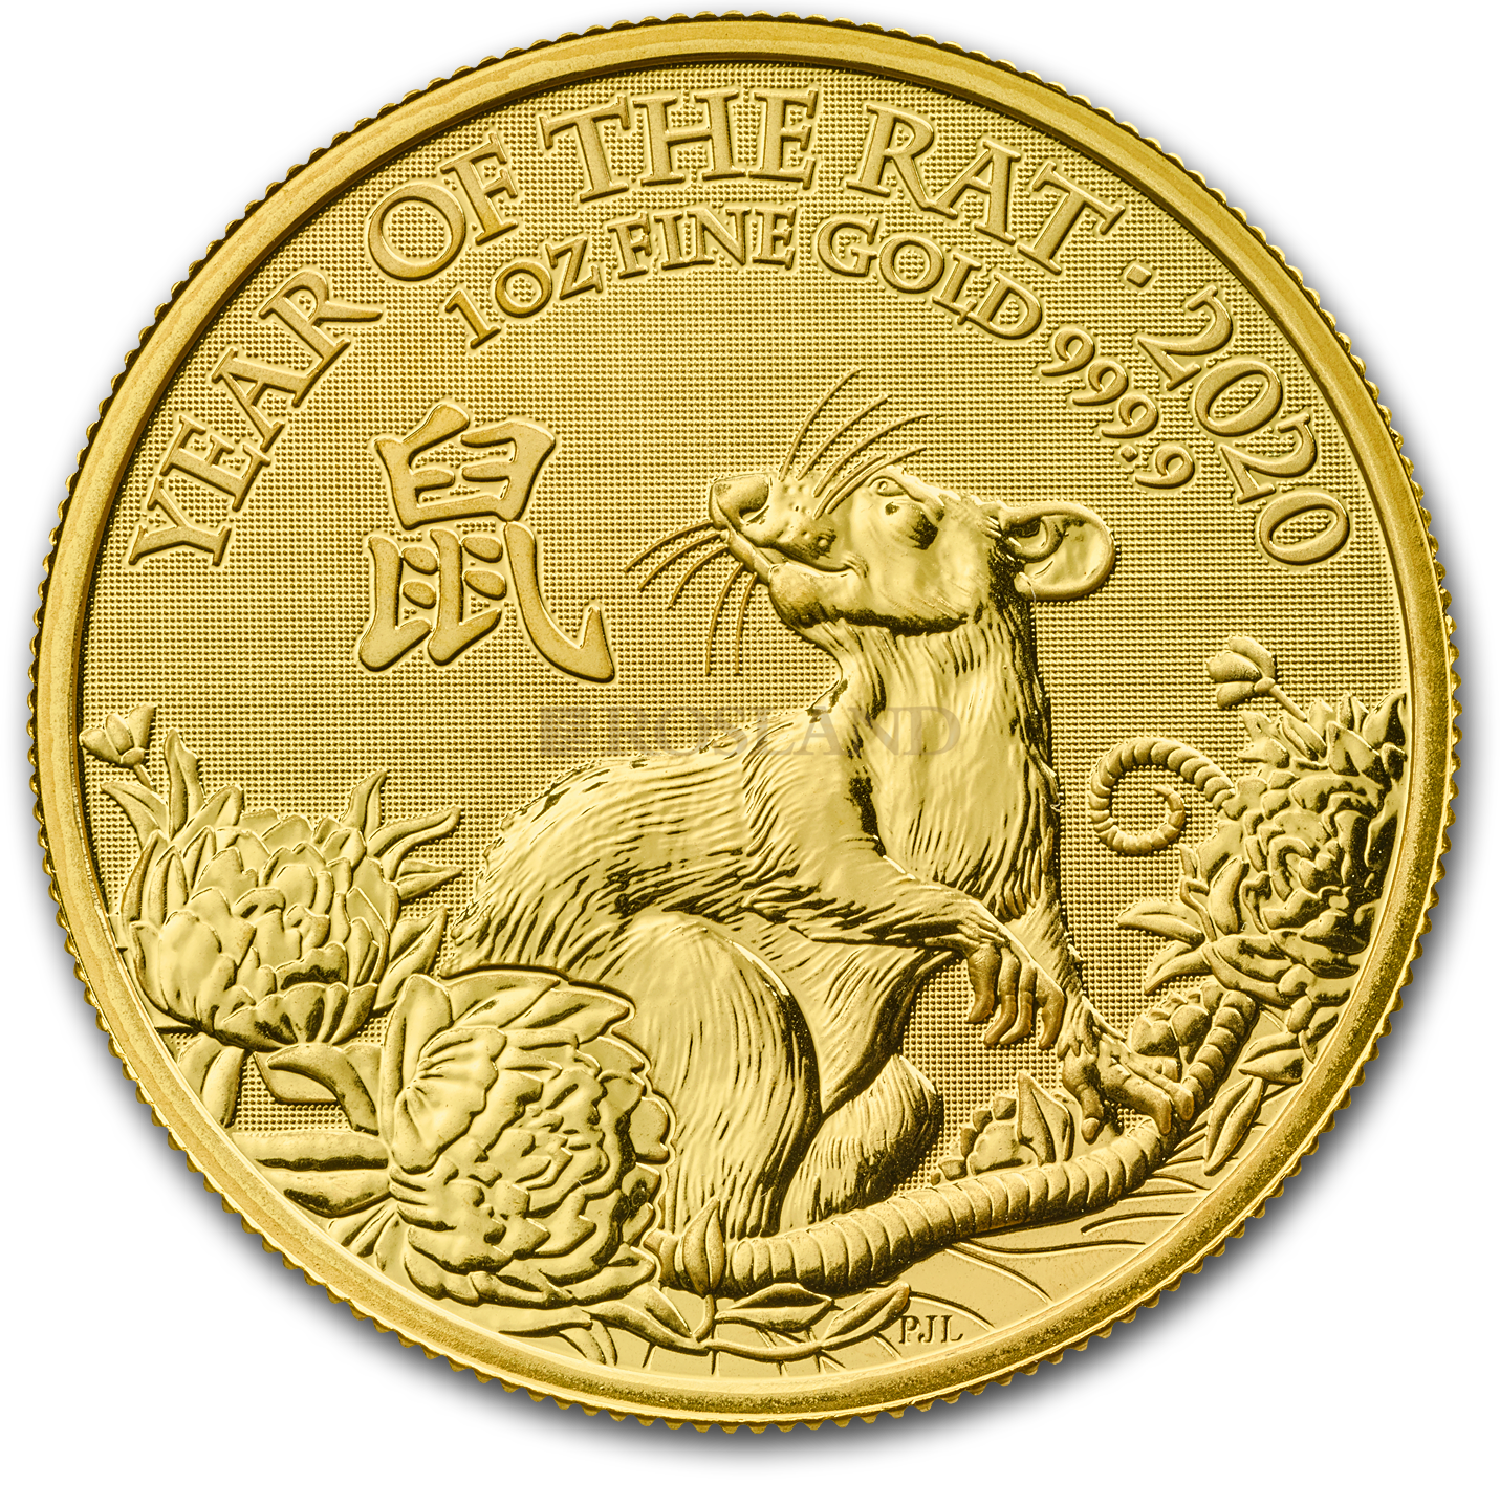 1 Unze Goldmünze Großbritannien Lunar Ratte 2020